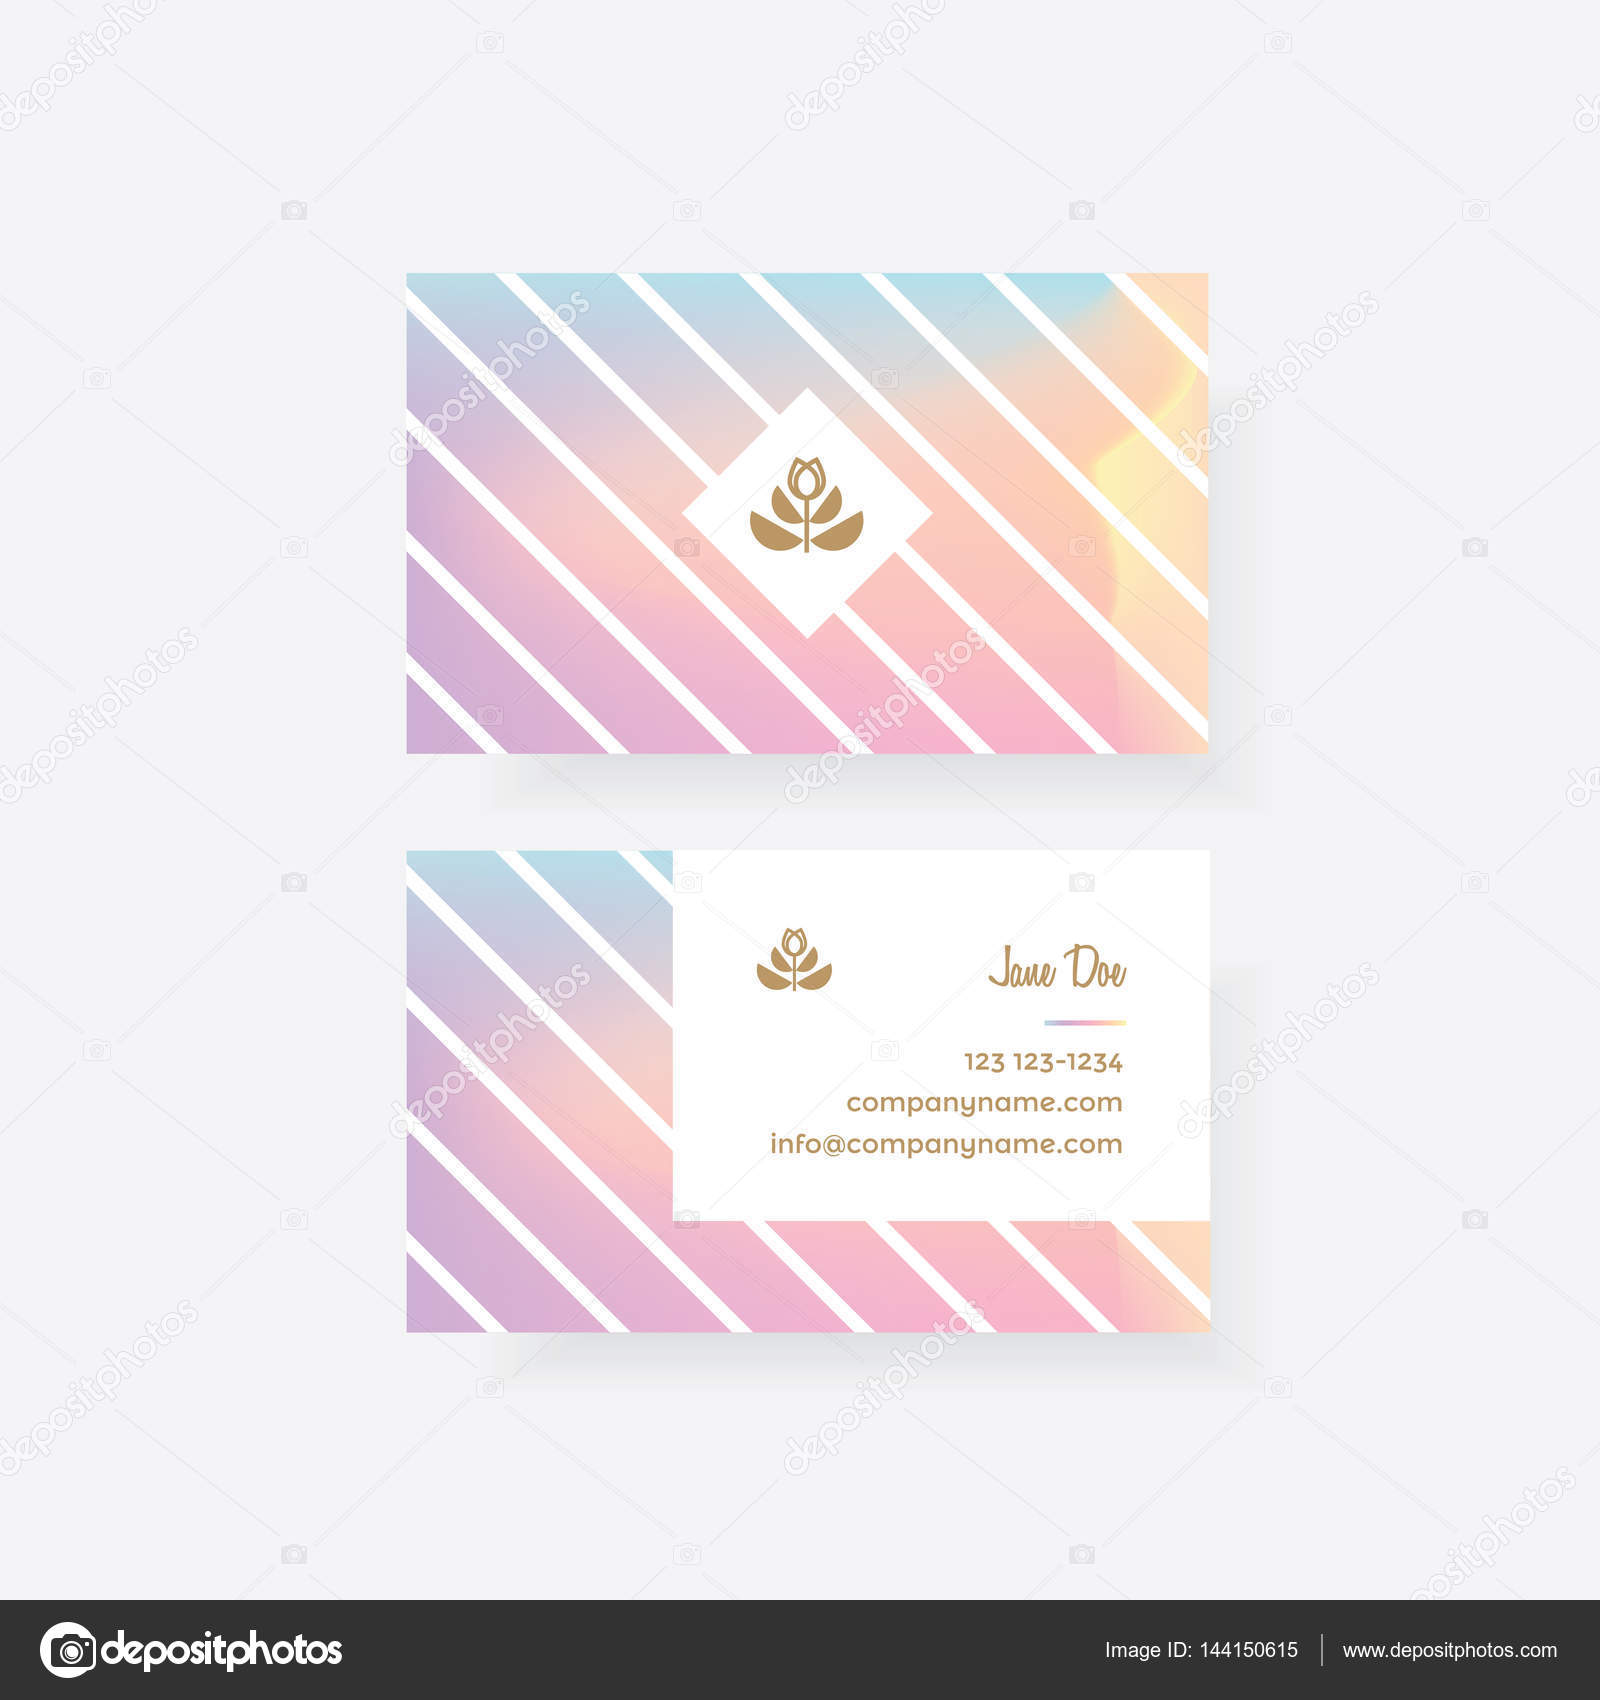 Feminine business card — Stock Vector © DianaHlevnjak #144150615